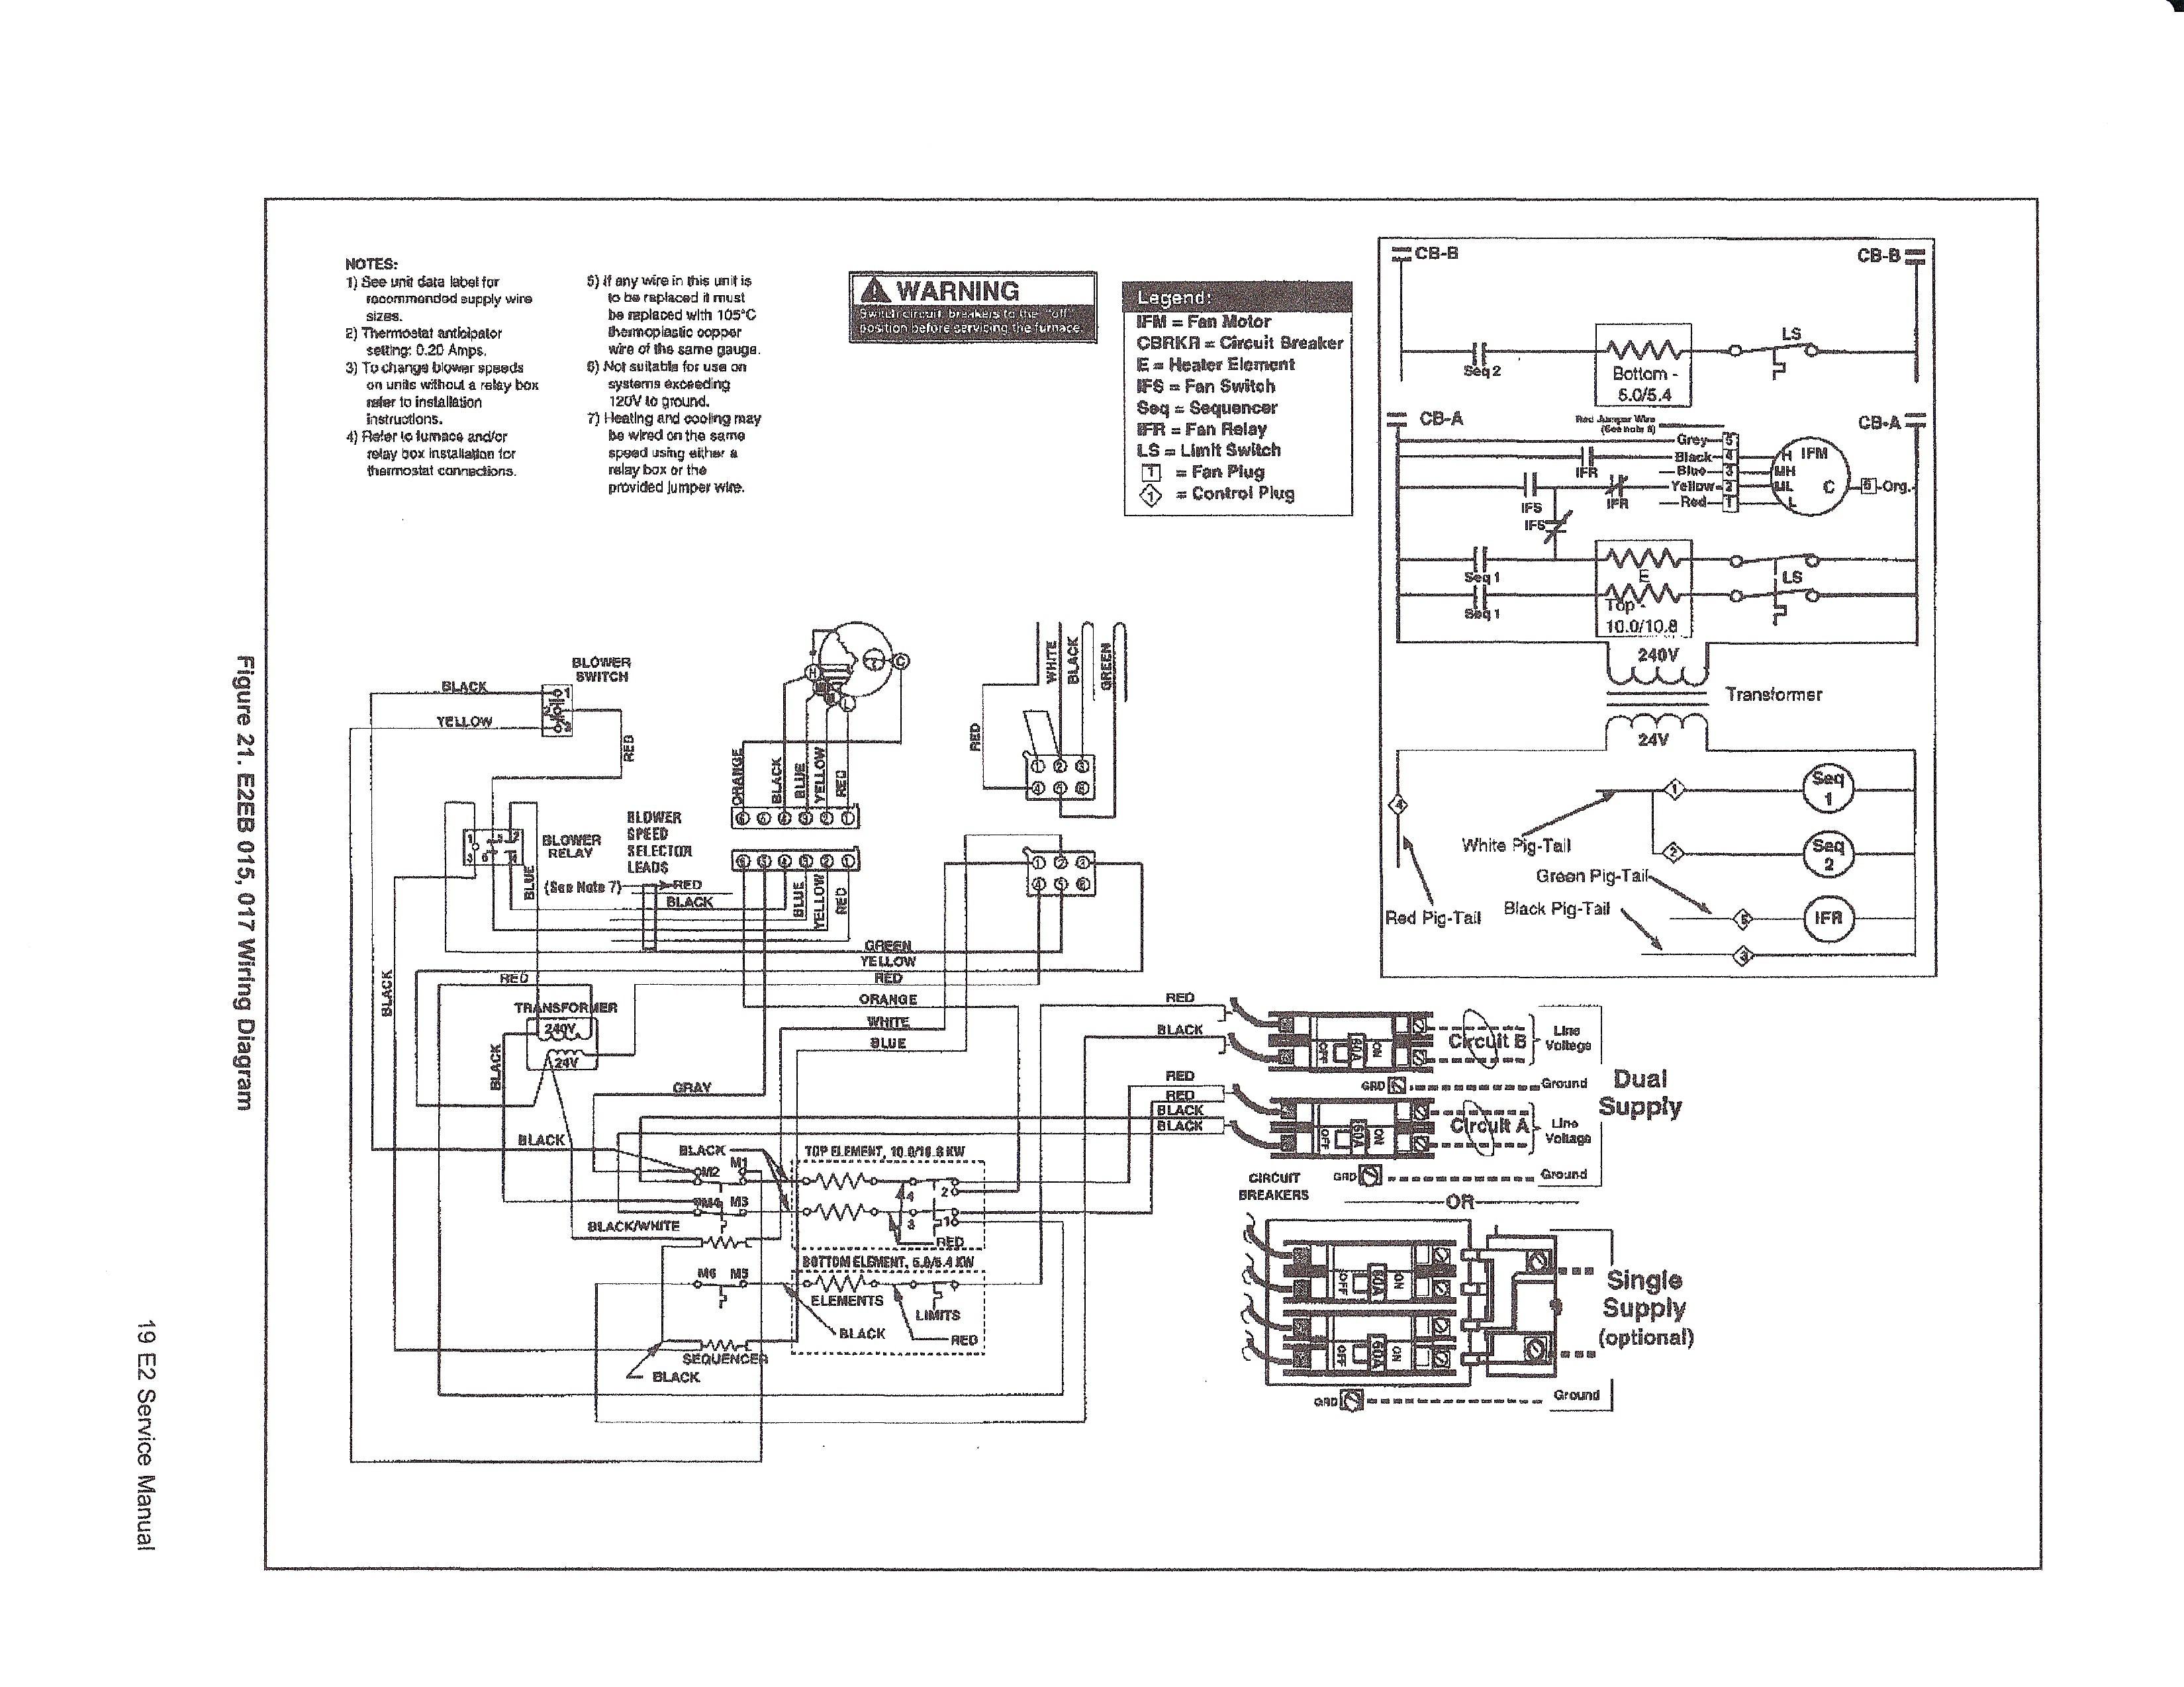 Intertherm Electric Furnace Wiring Diagram Unique Intertherm Electric Furnace Wiring Diagram Luxury Design Bright